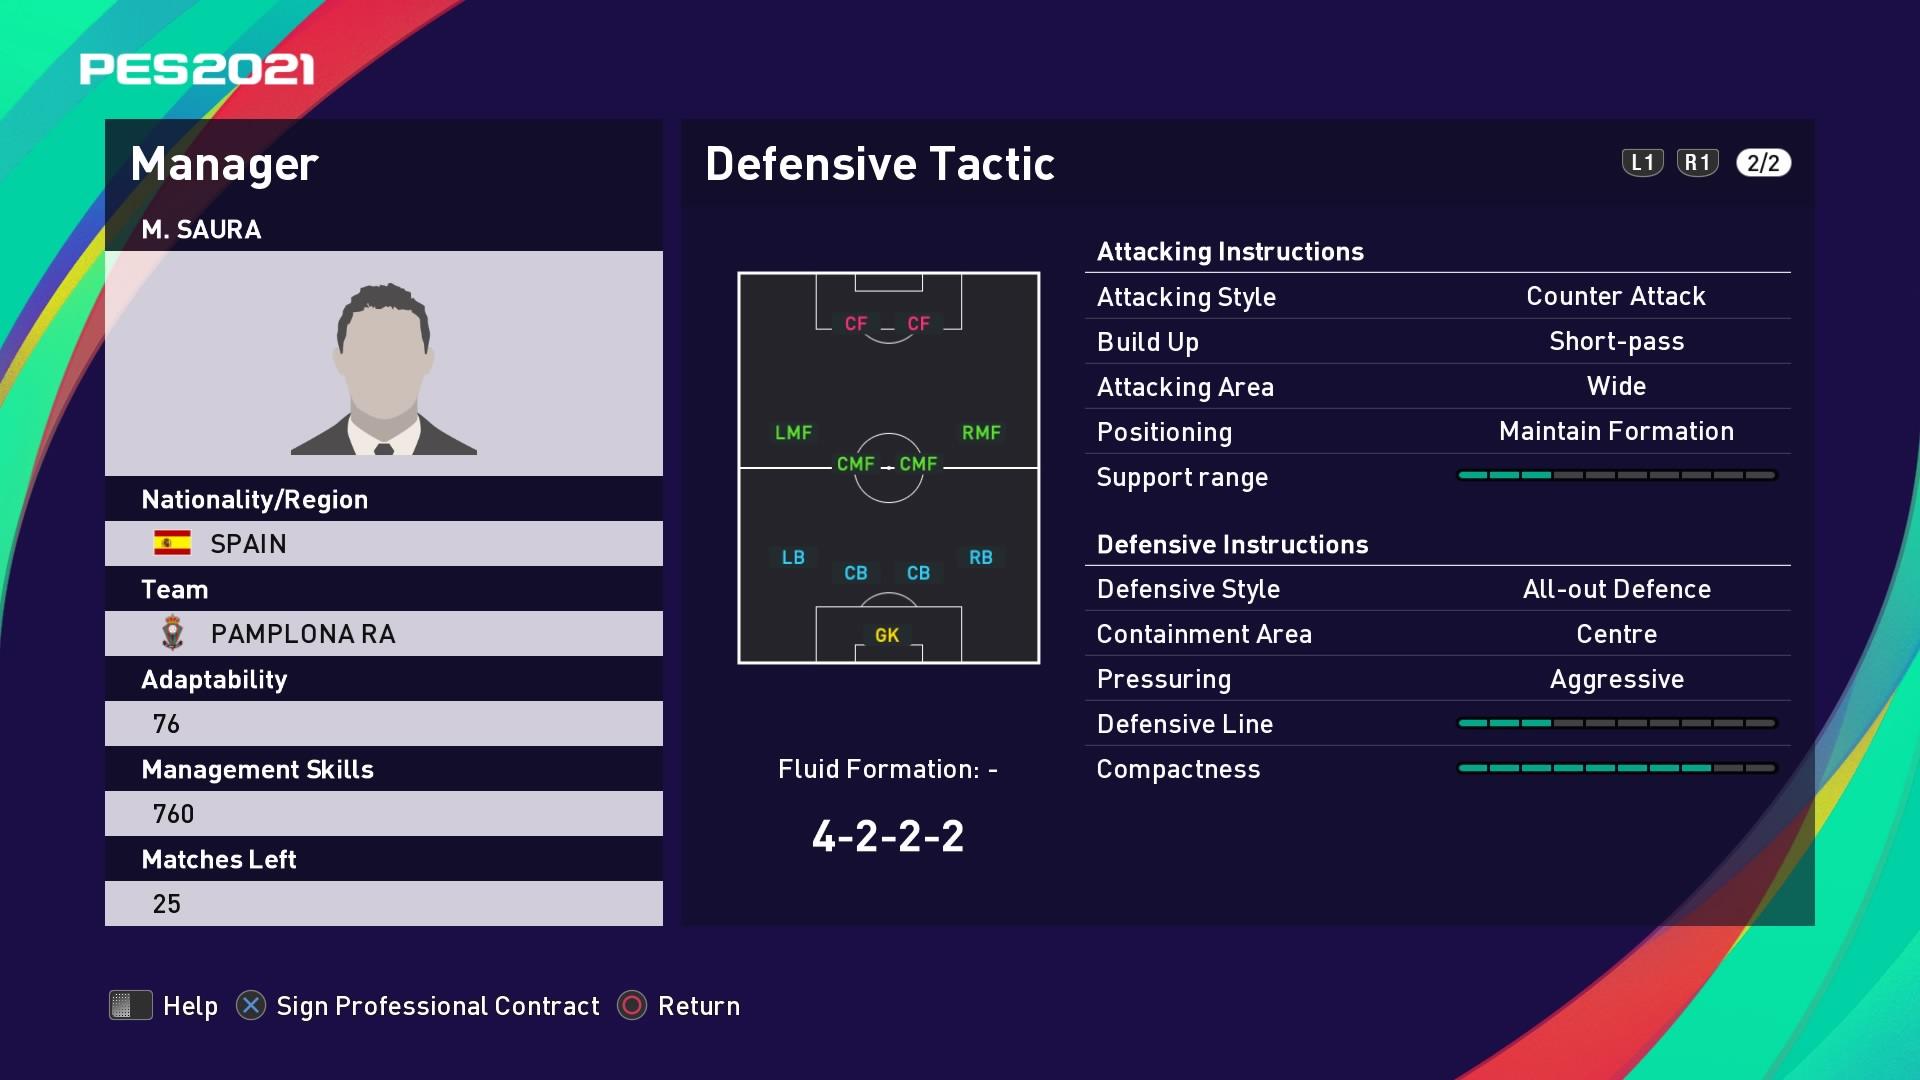 M. Saura (Jagoba Arrasate) Defensive Tactic in PES 2021 myClub